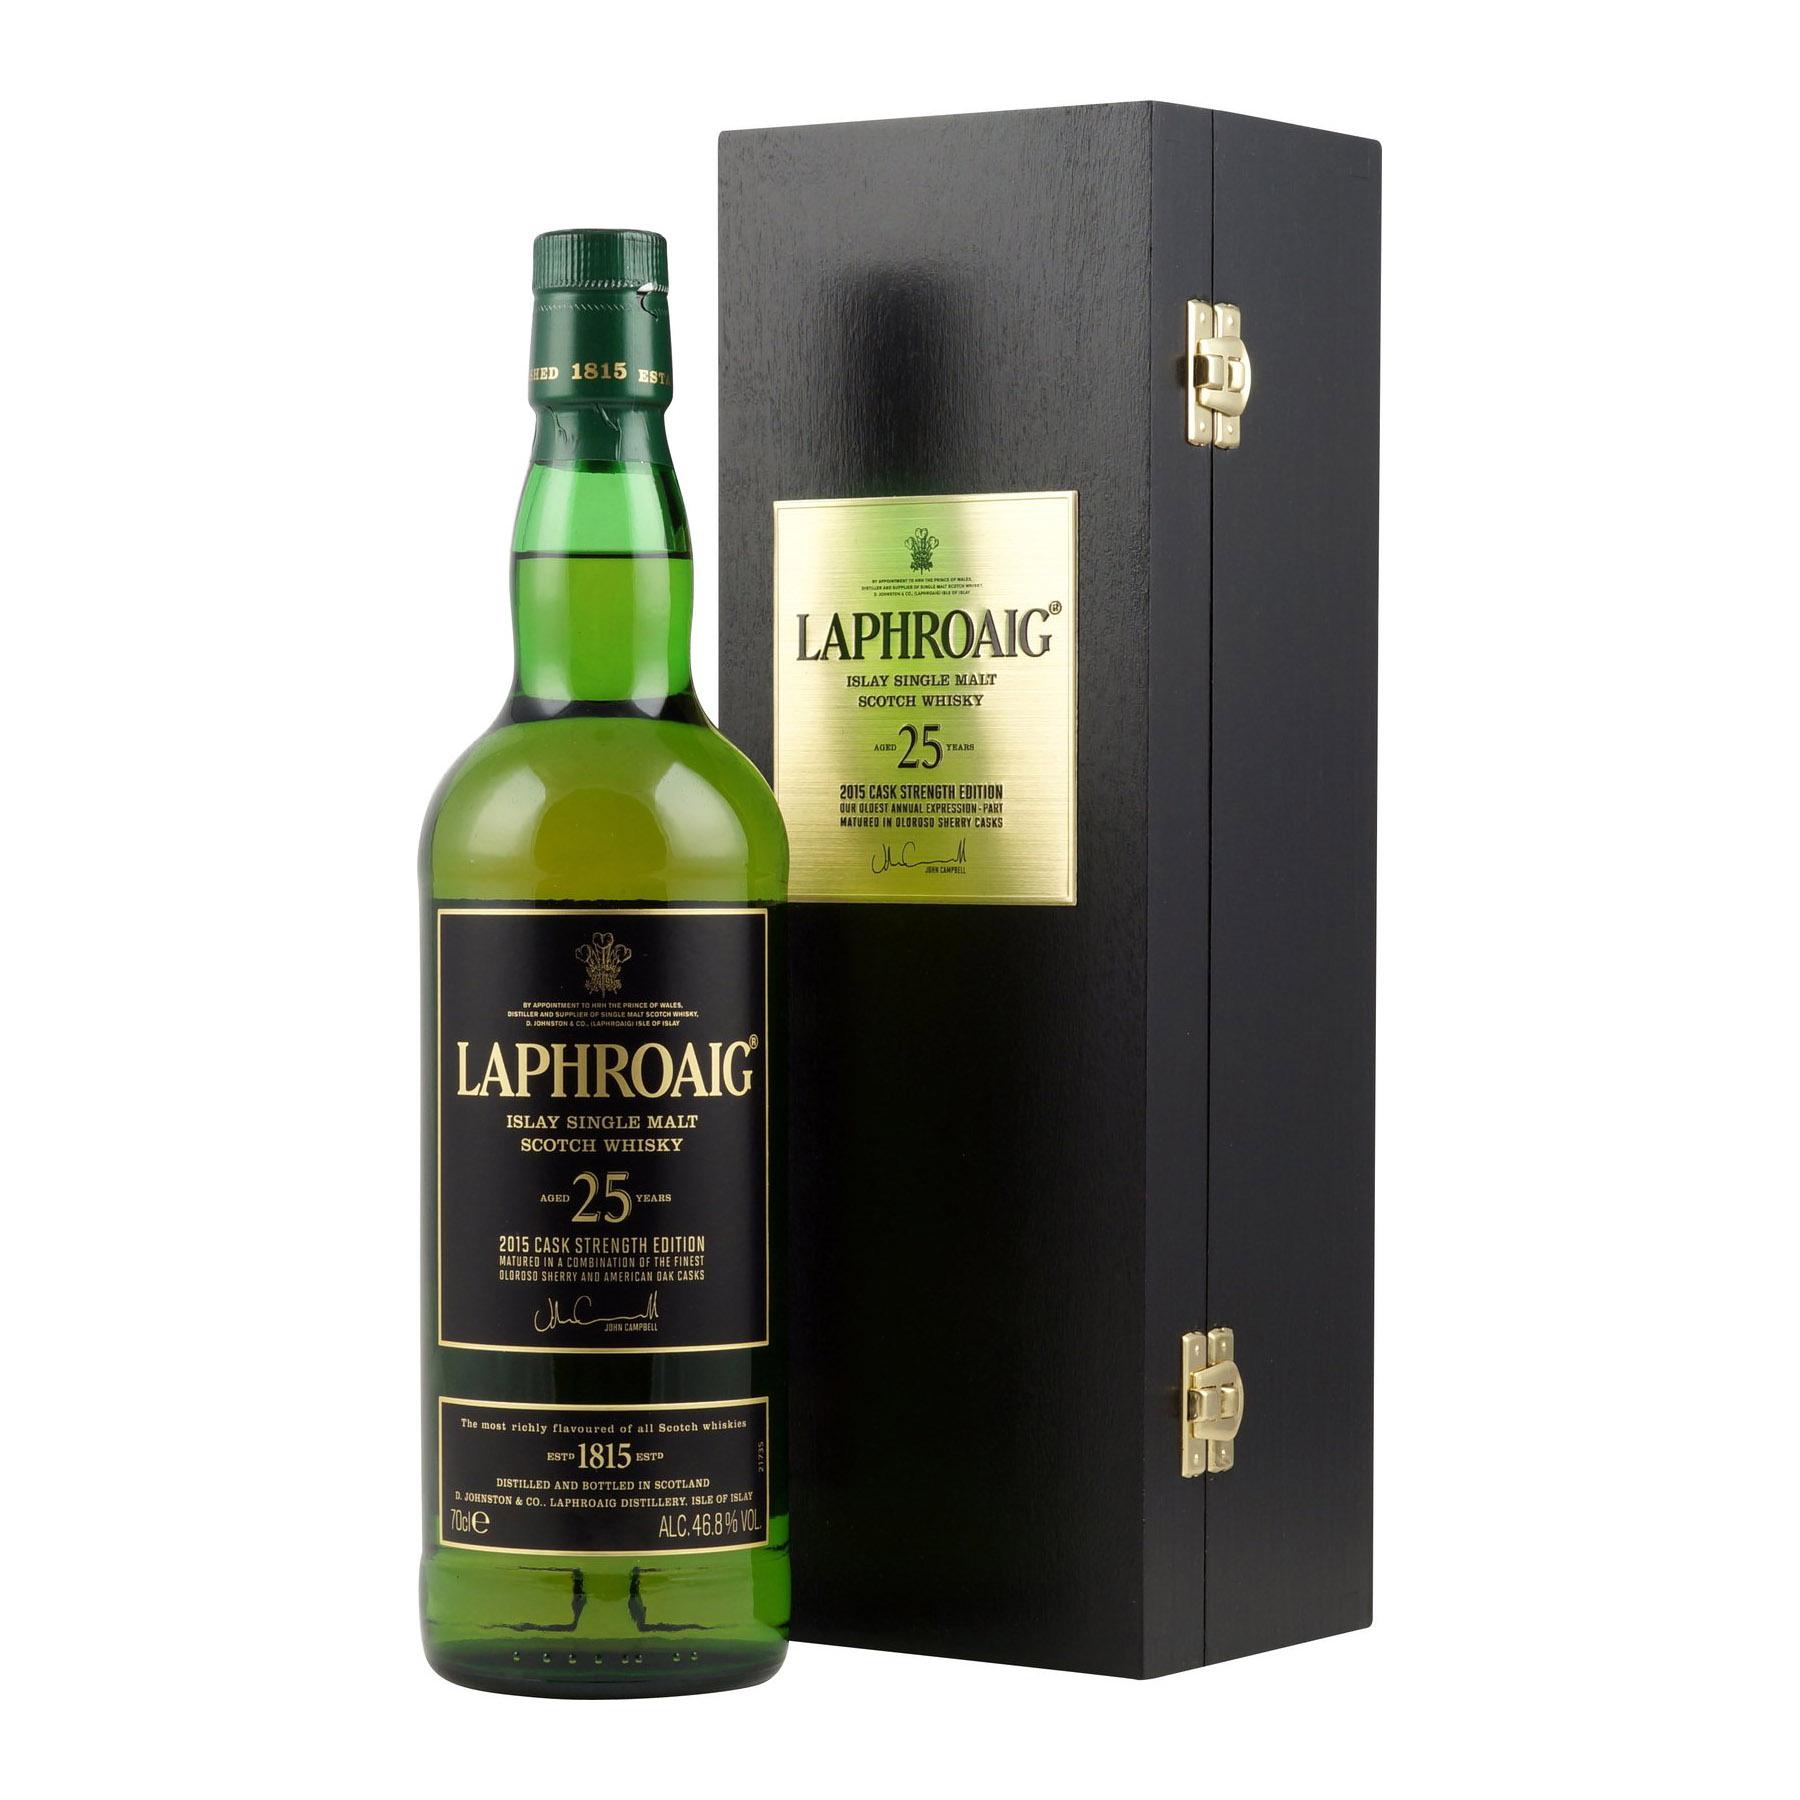 Laphroaig 25 Year Old Single Malt Scotch Whisky 2015 Edition